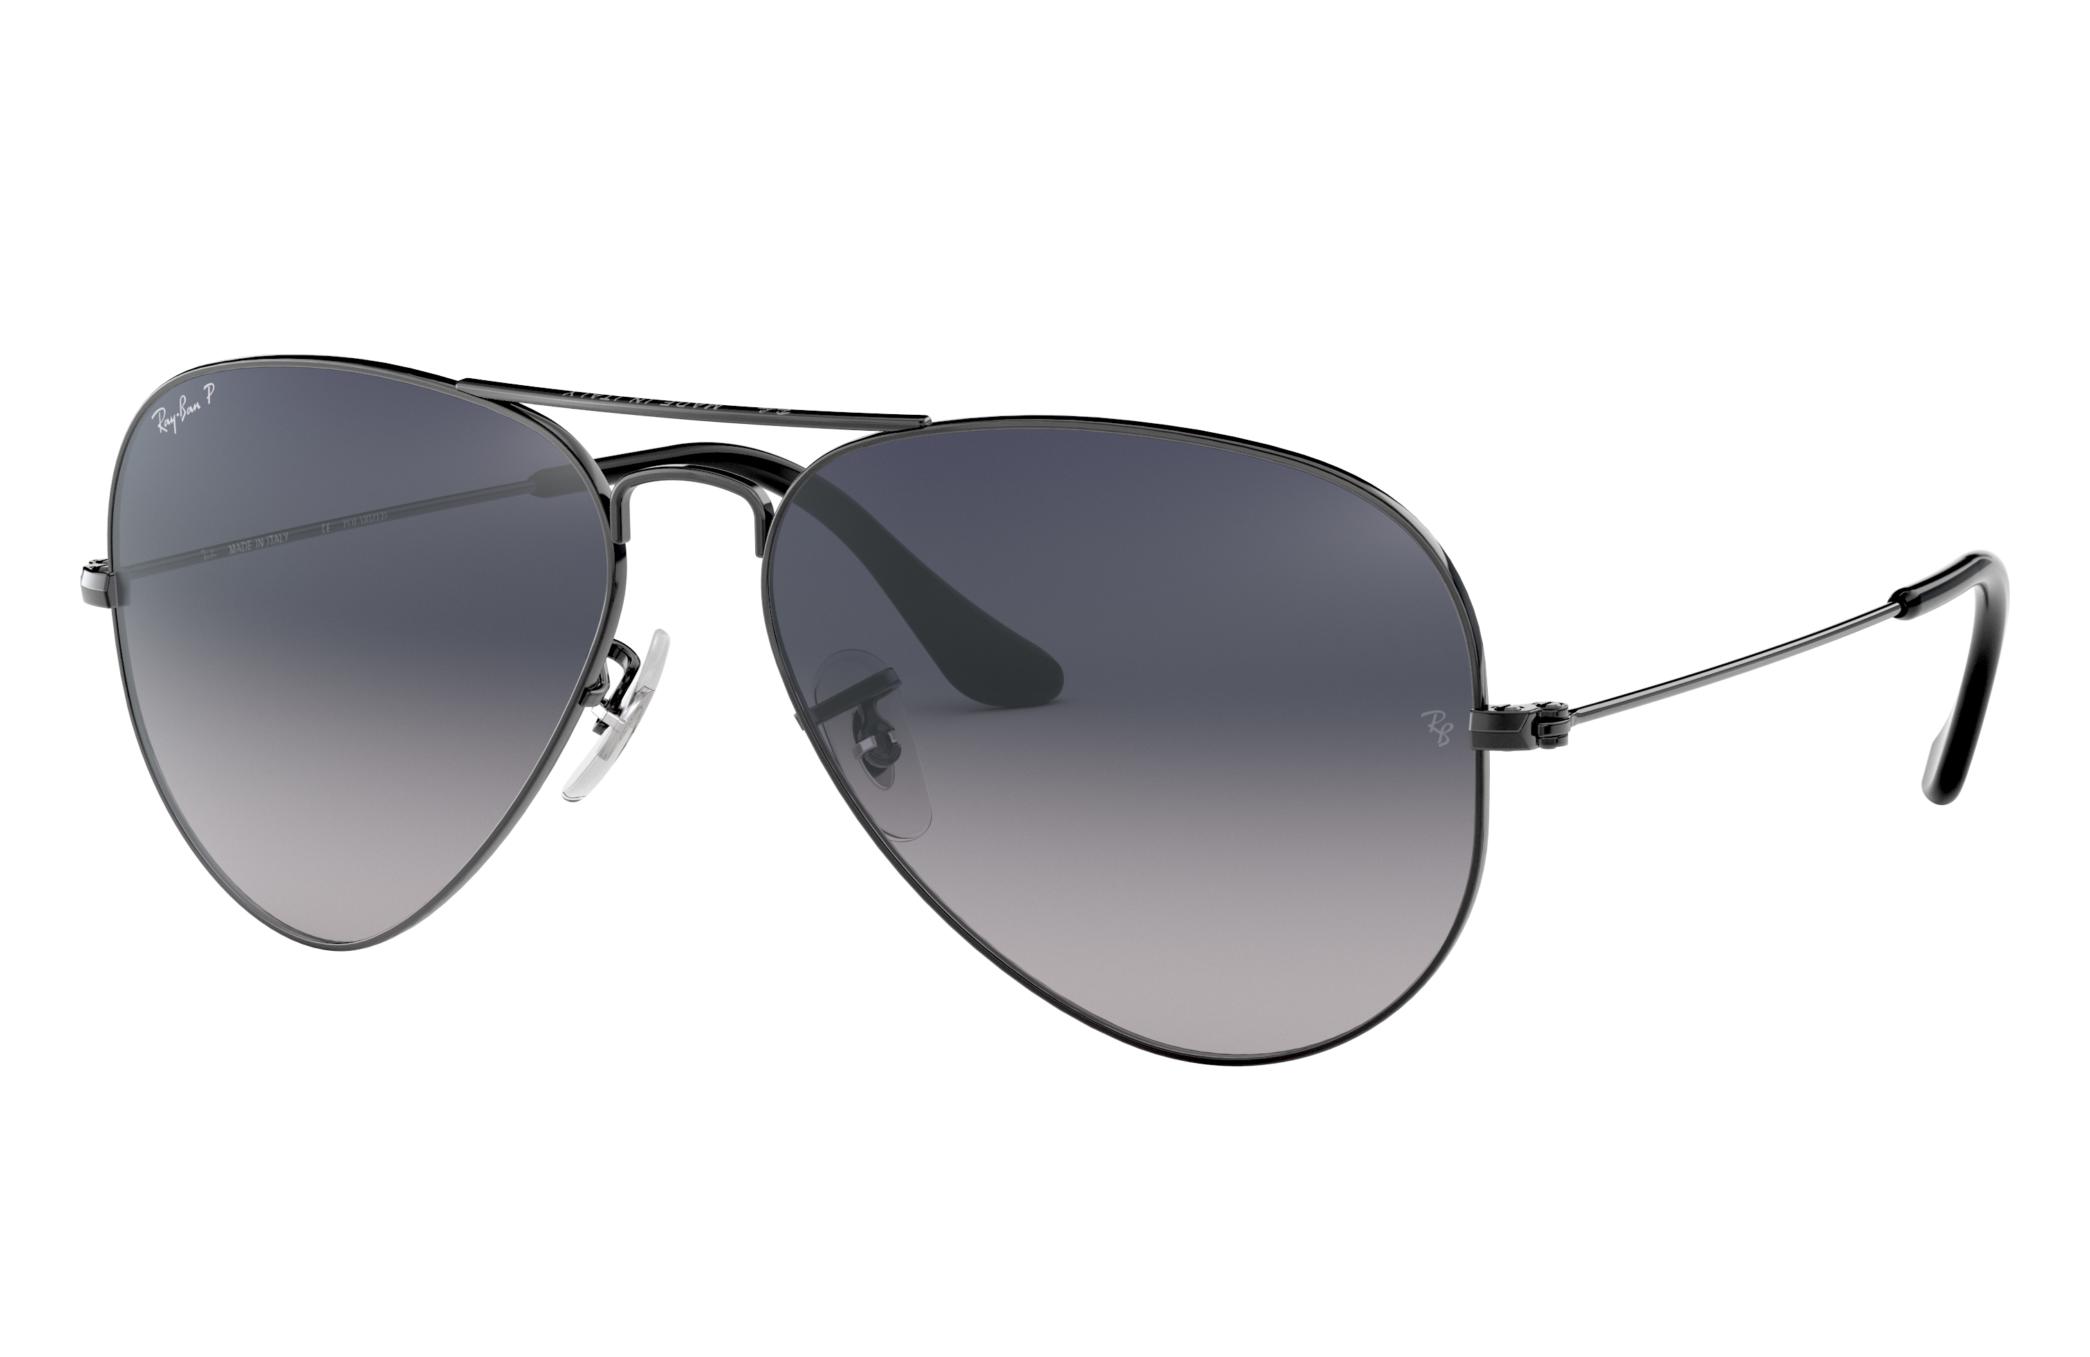 Ray-Ban Aviator Gradient Gunmetal, Polarized Blue Lenses - RB3025